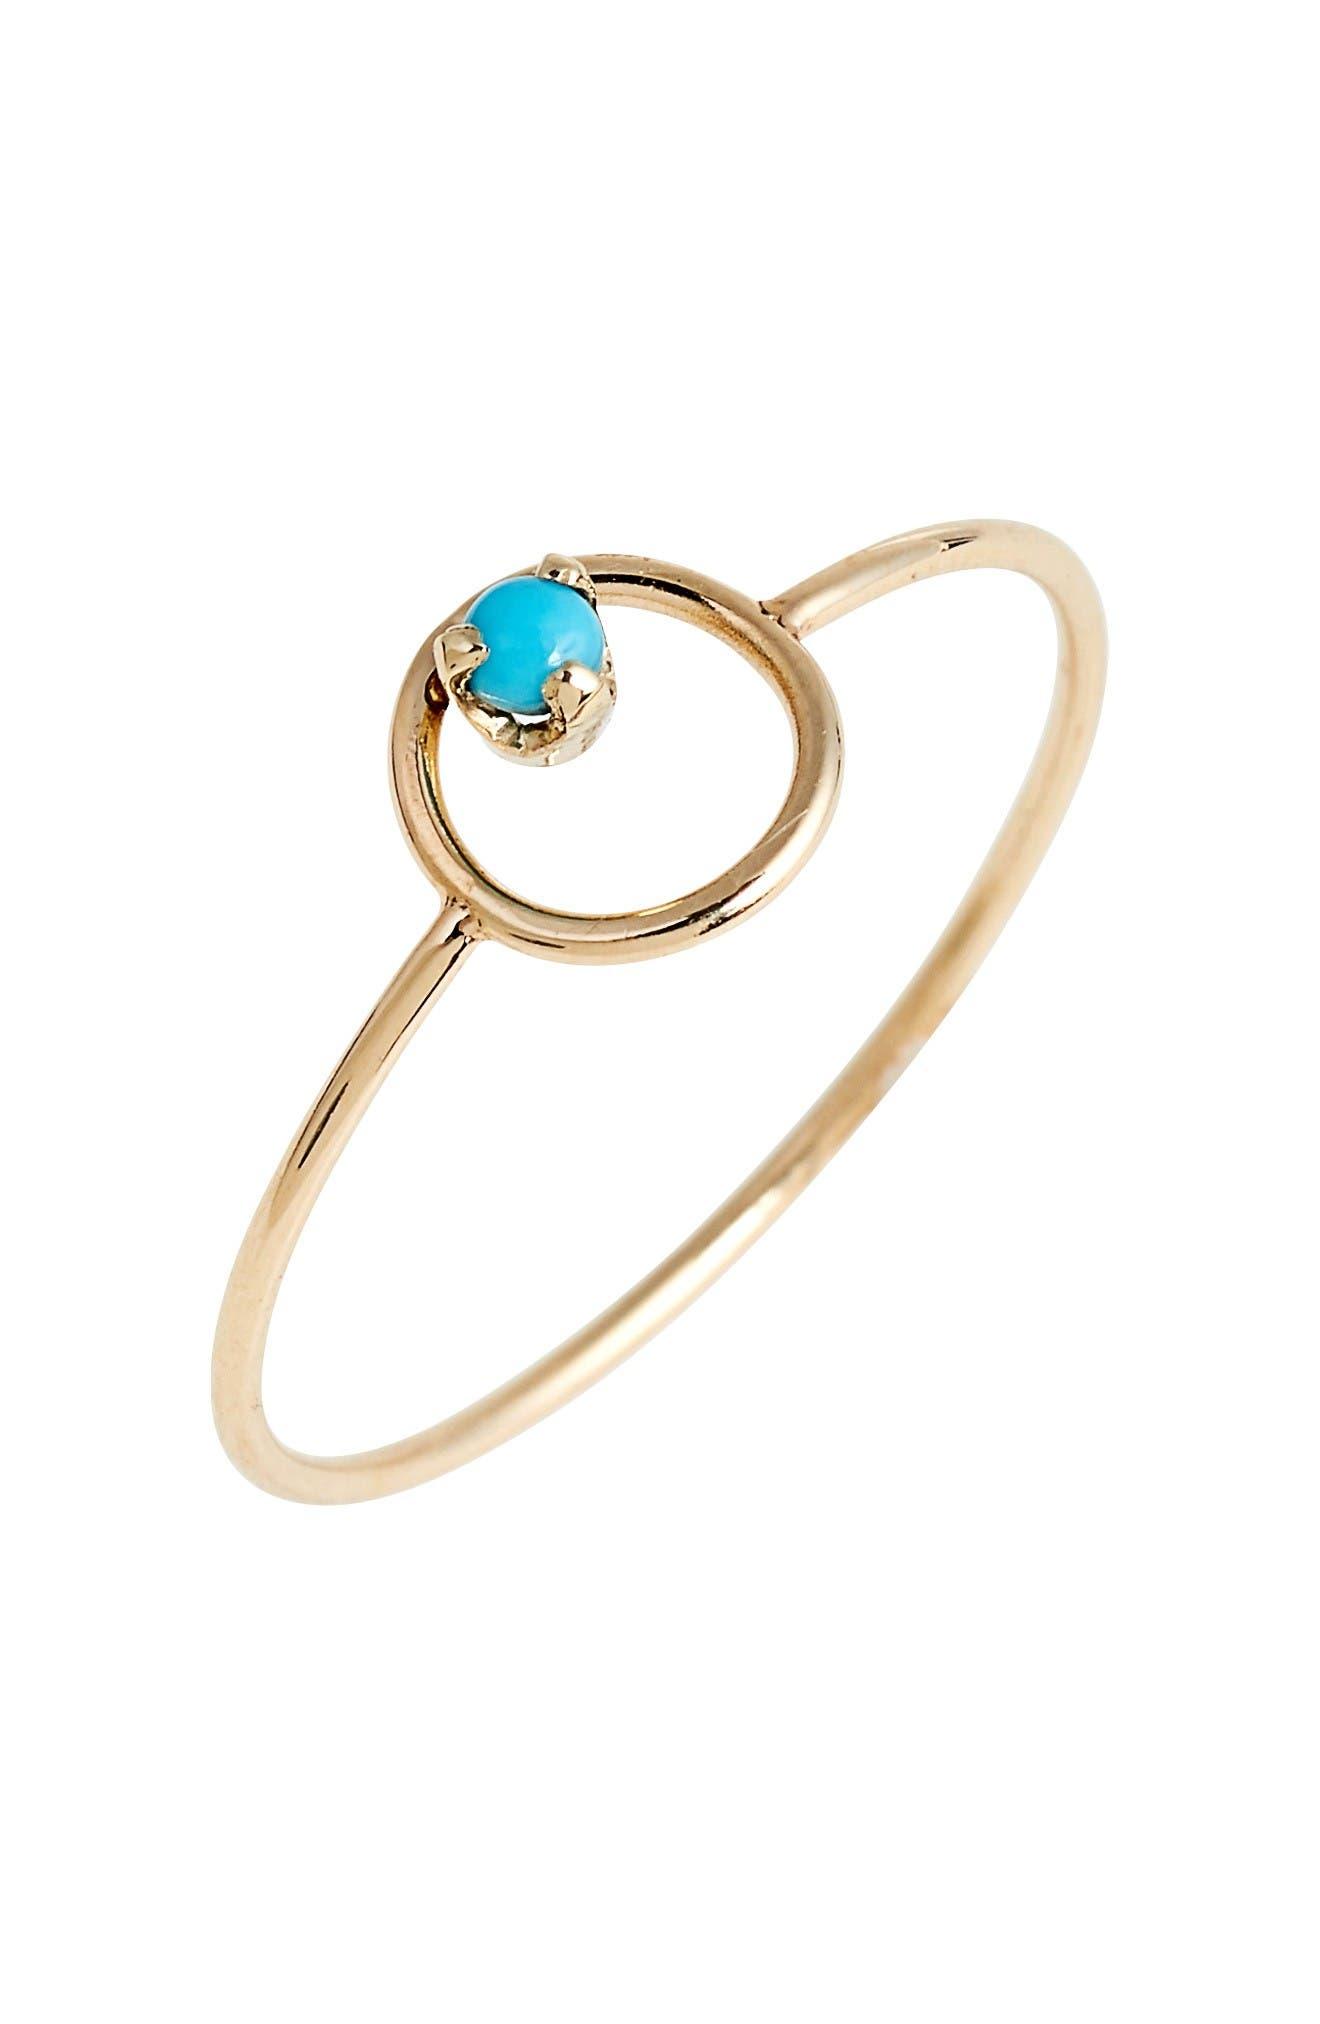 Main Image - Zoë Chicco Turquoise Circle Ring